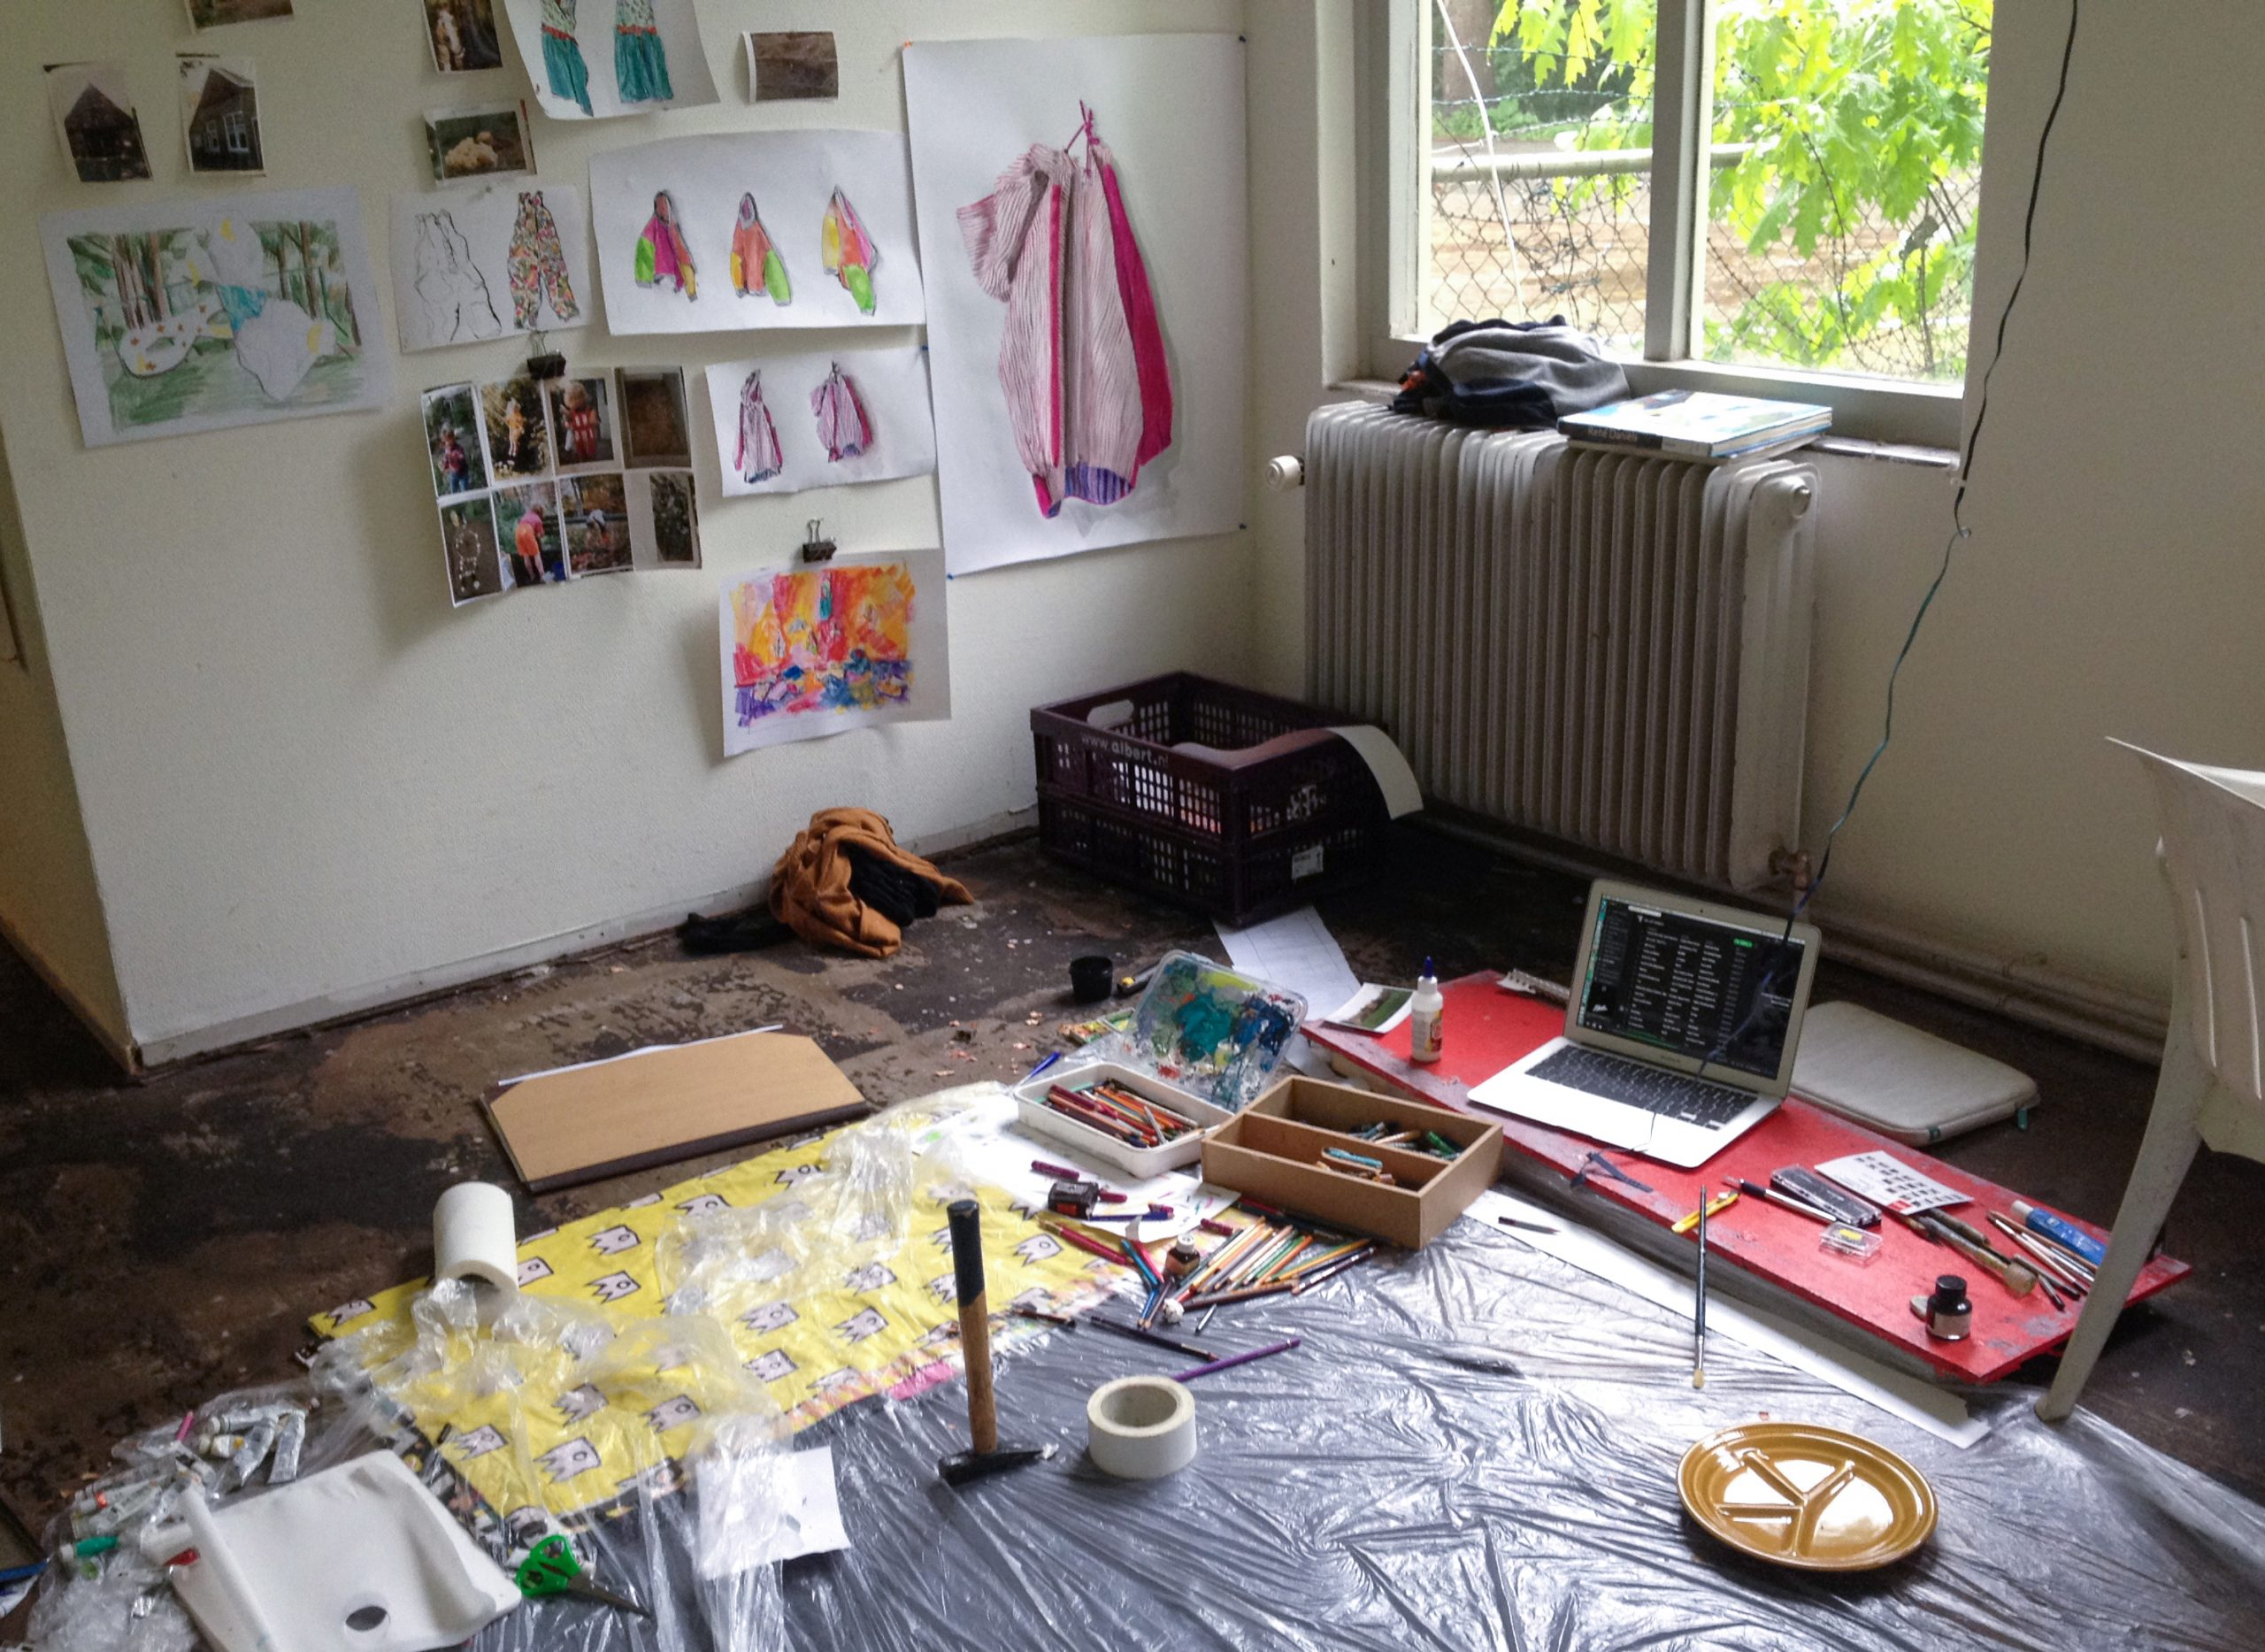 Britt Dorenbosch Code Rood Artist in Residence Portiersloge